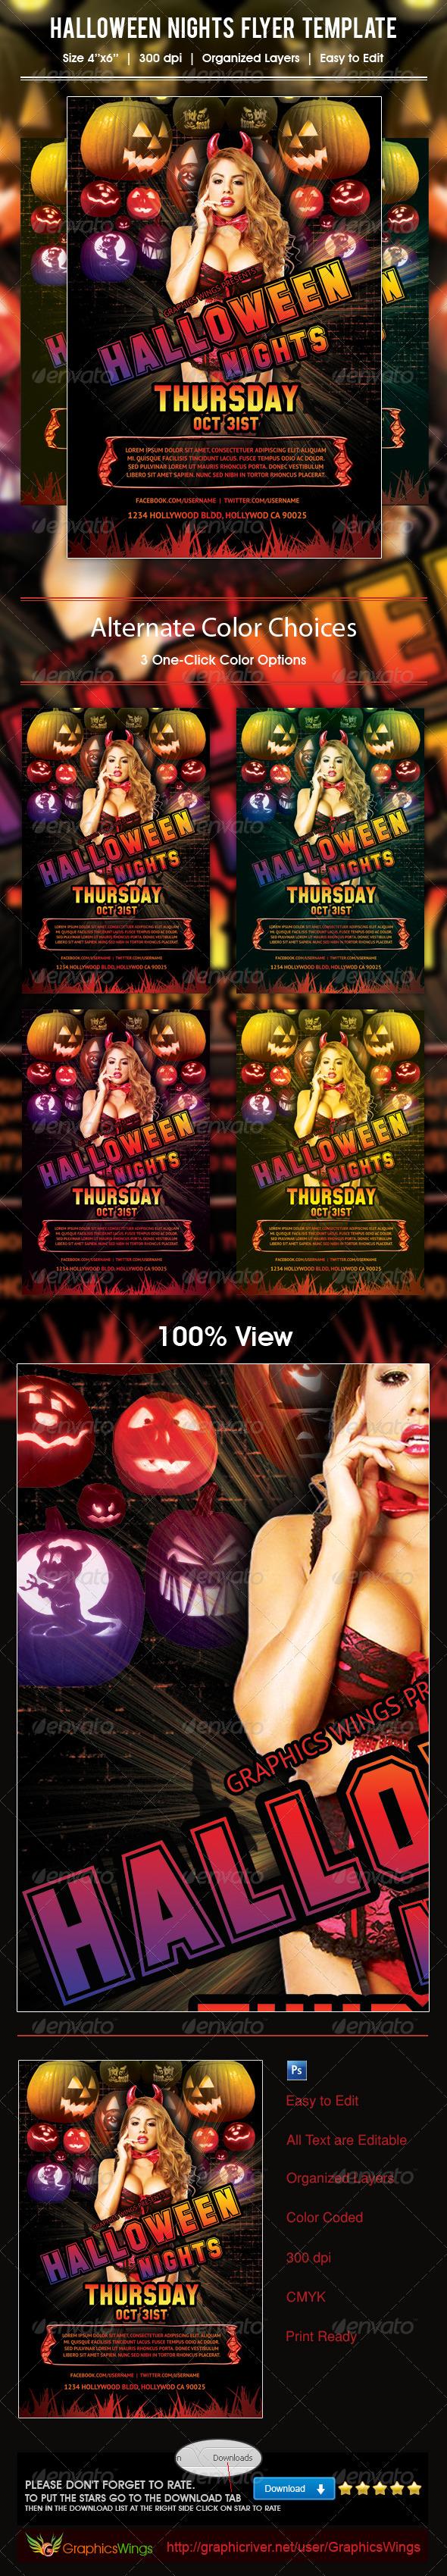 GraphicRiver Halloween Nights Flyer Template 5933861